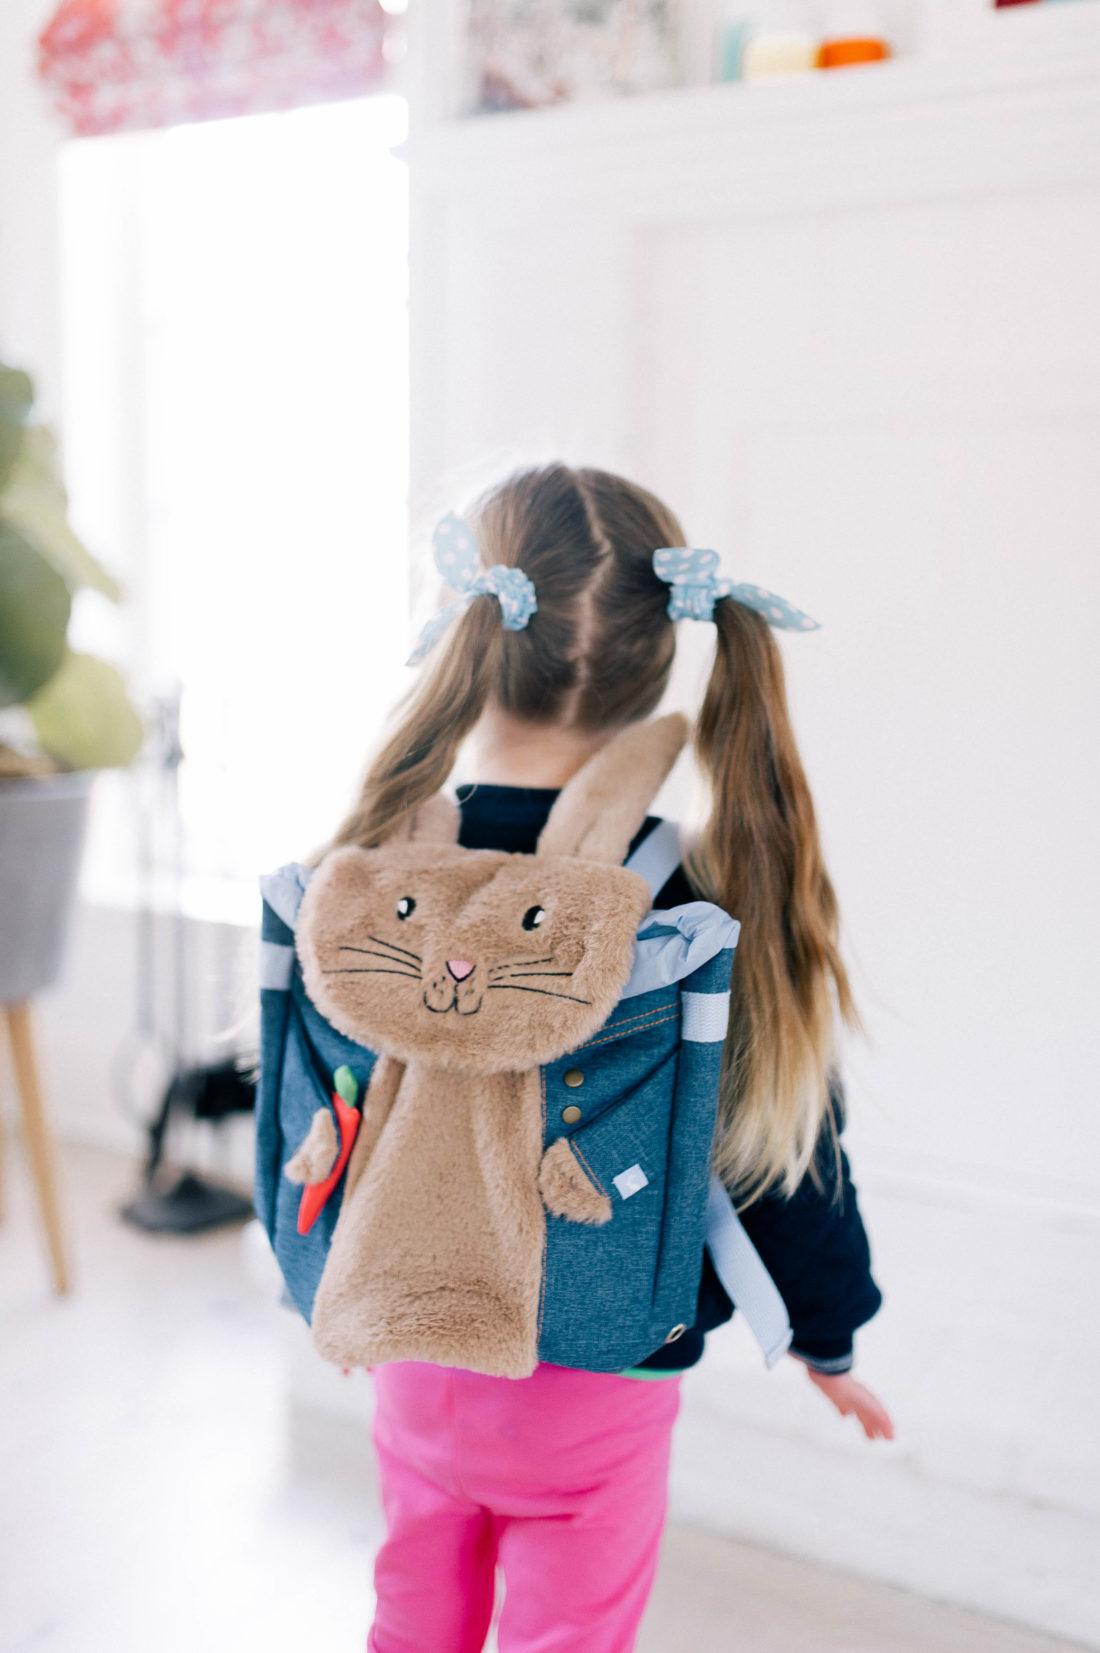 Marlowe Martino wears a fuzzy Peter Rabbit backpack